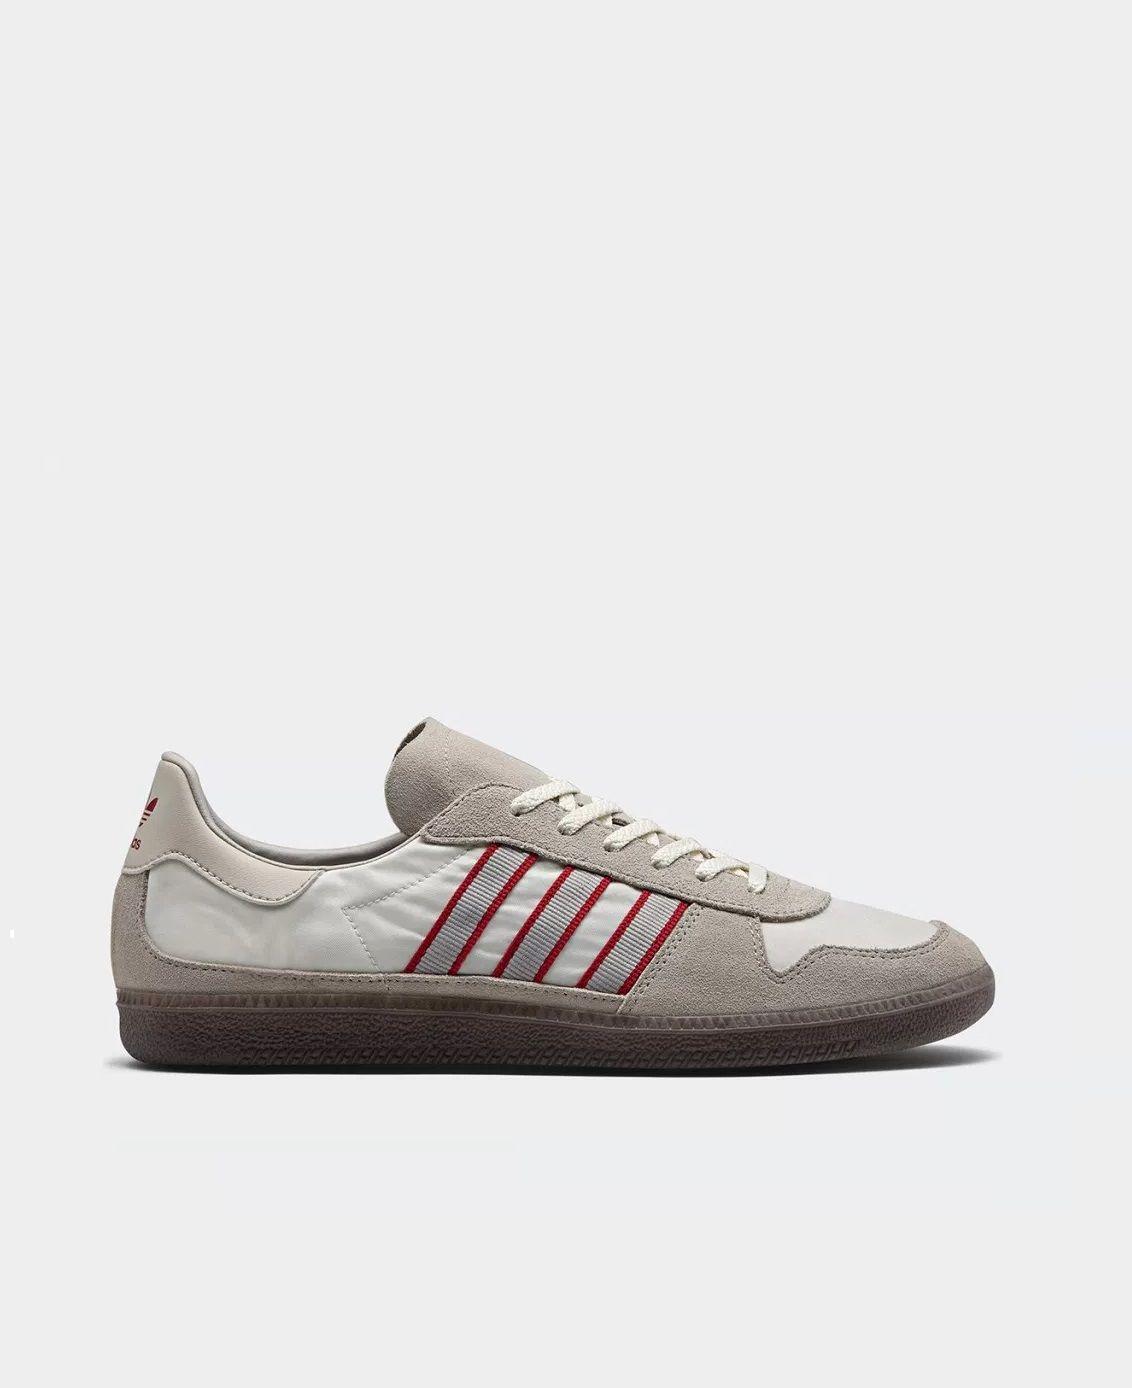 adidas Originals Huyton SPZL | Sneakers: adidas Spezial